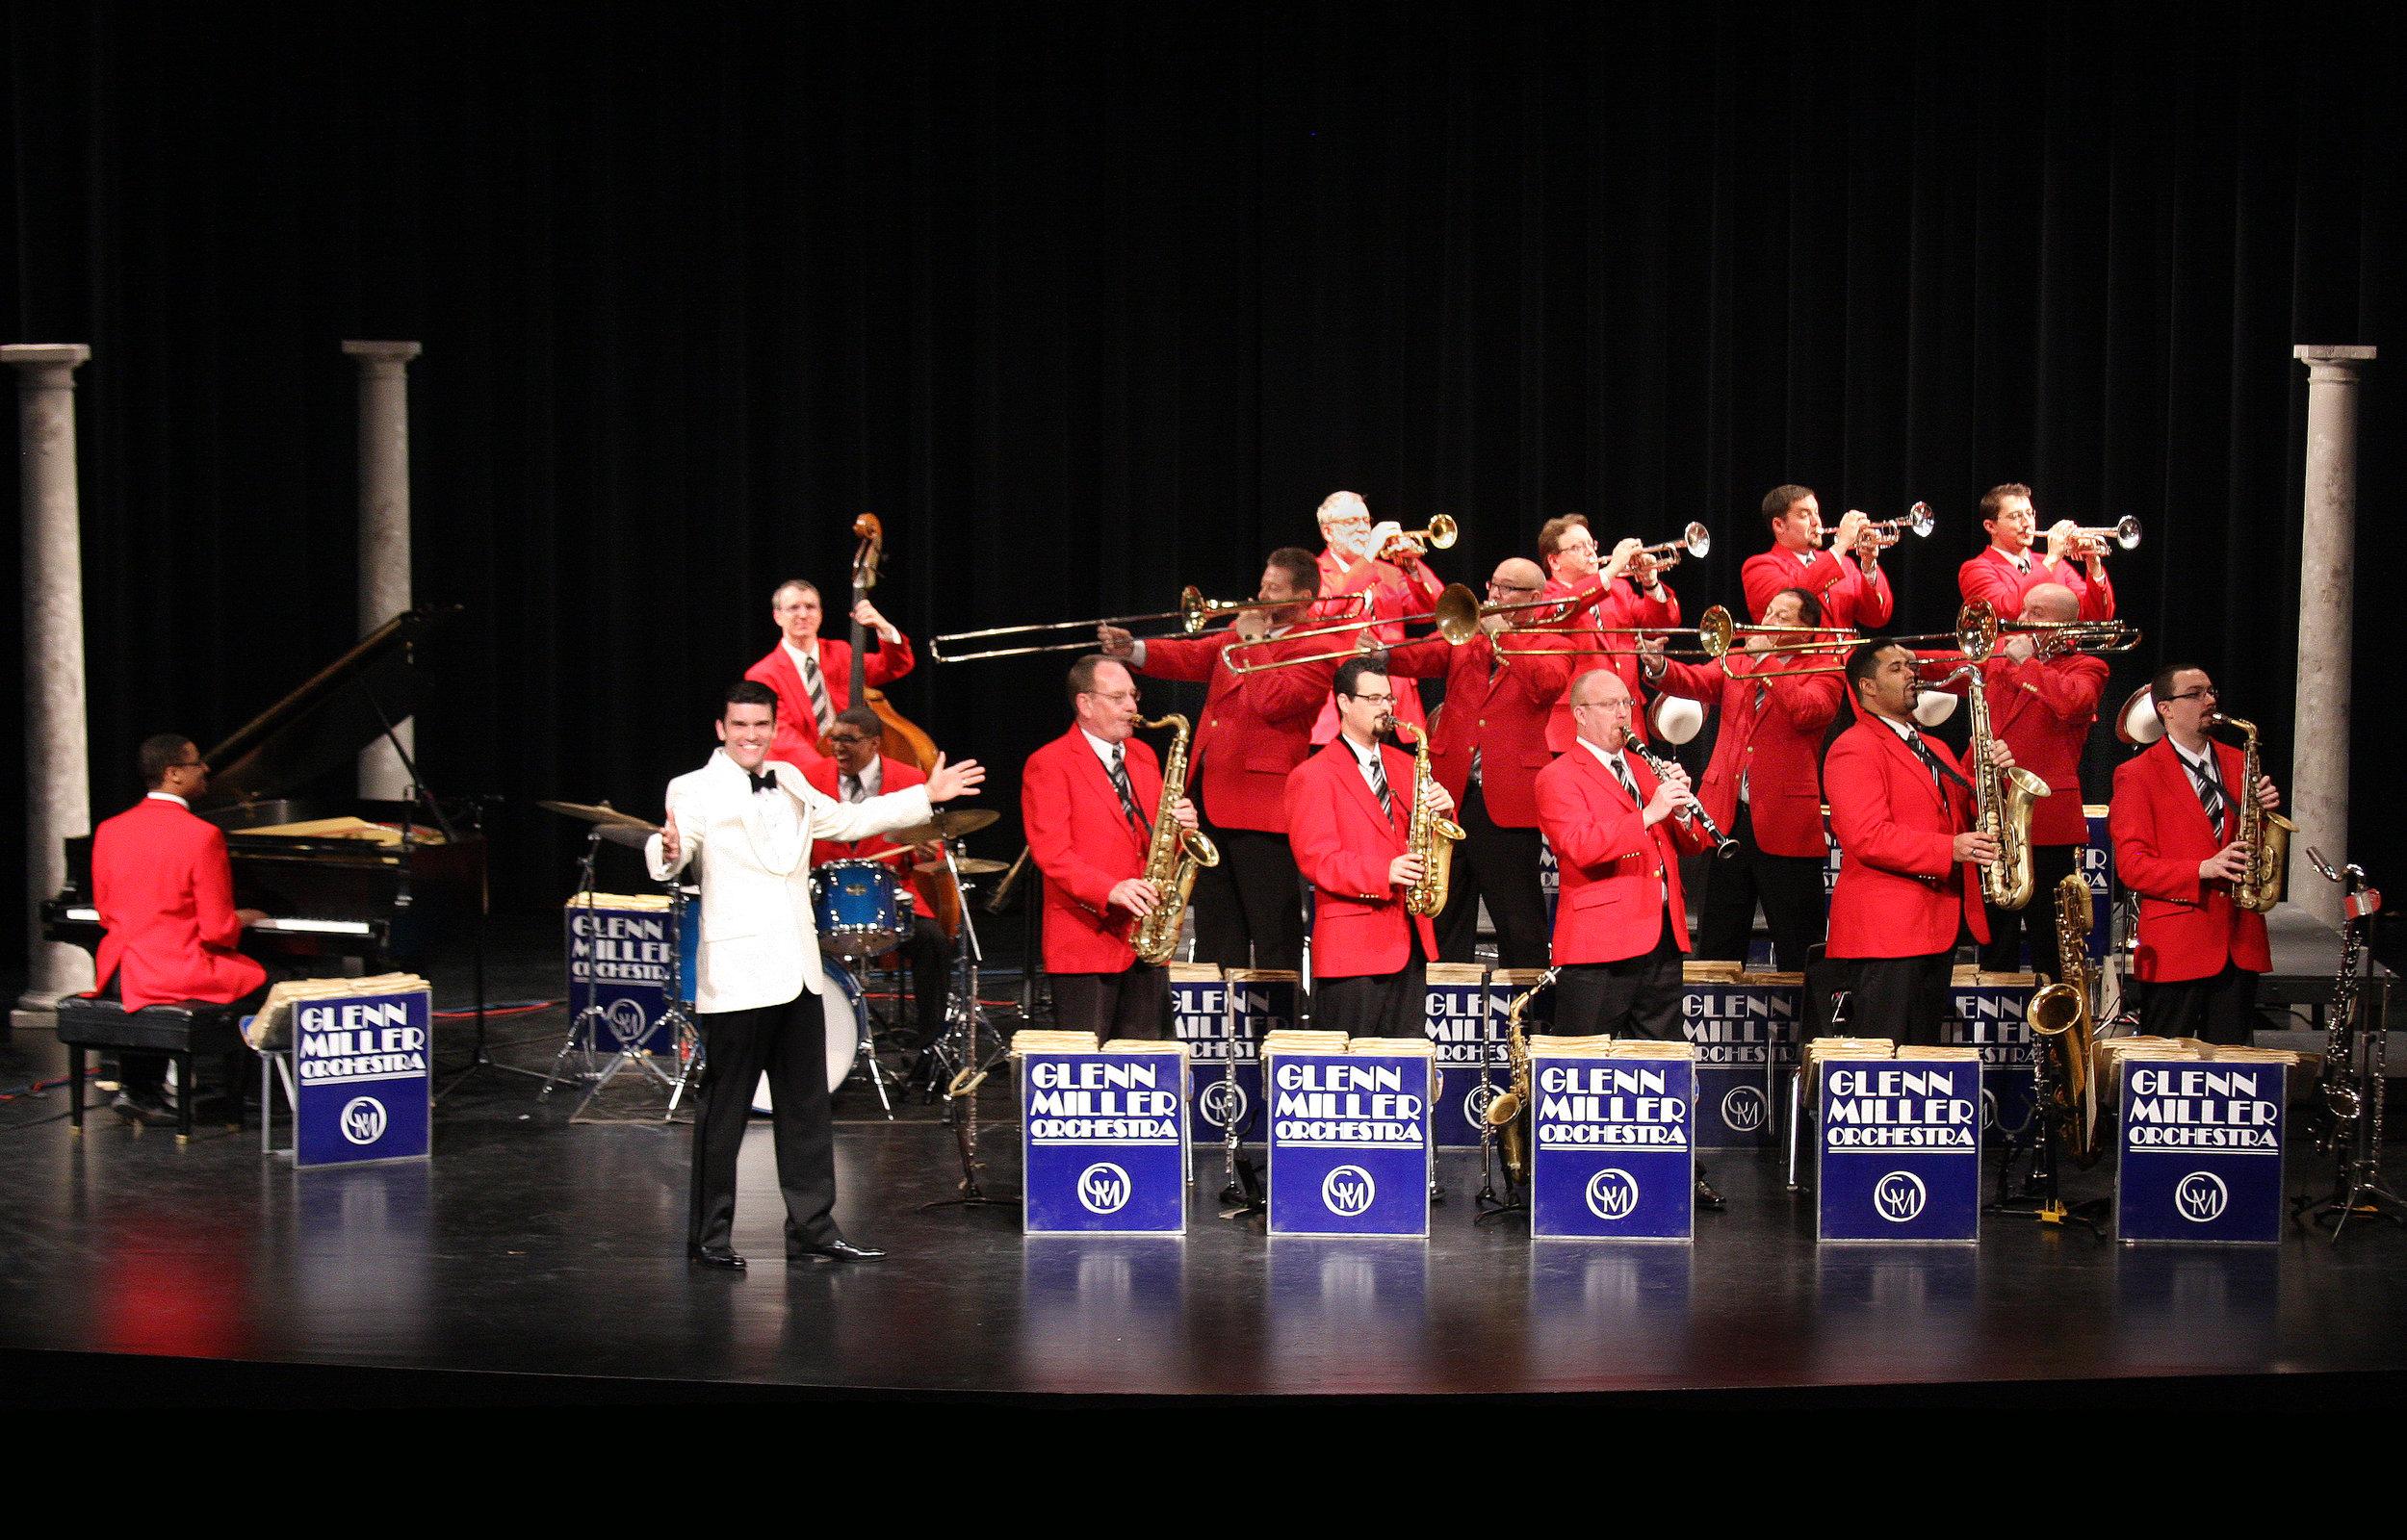 Glenn Miller Orchestra: In the Christmas Mood | 12.15.17